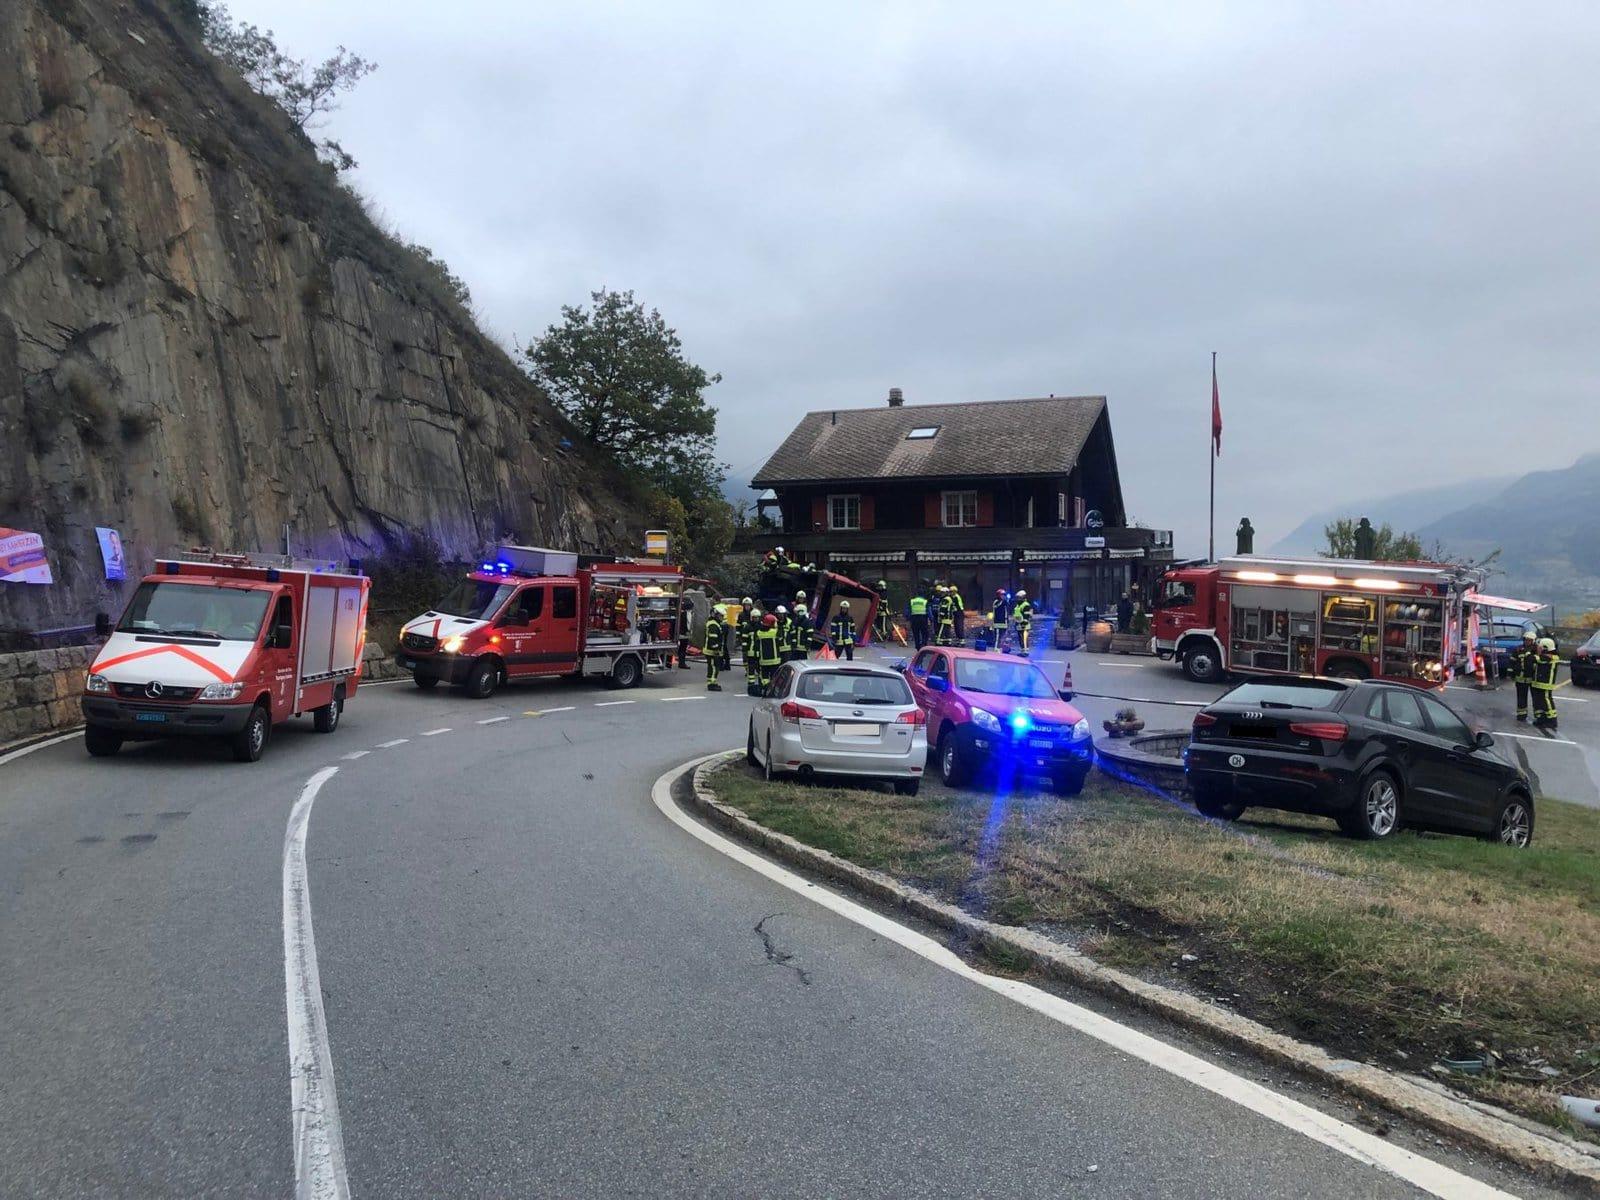 Martigny Combe Accident De Circulation 1 Mort 1 Blesse